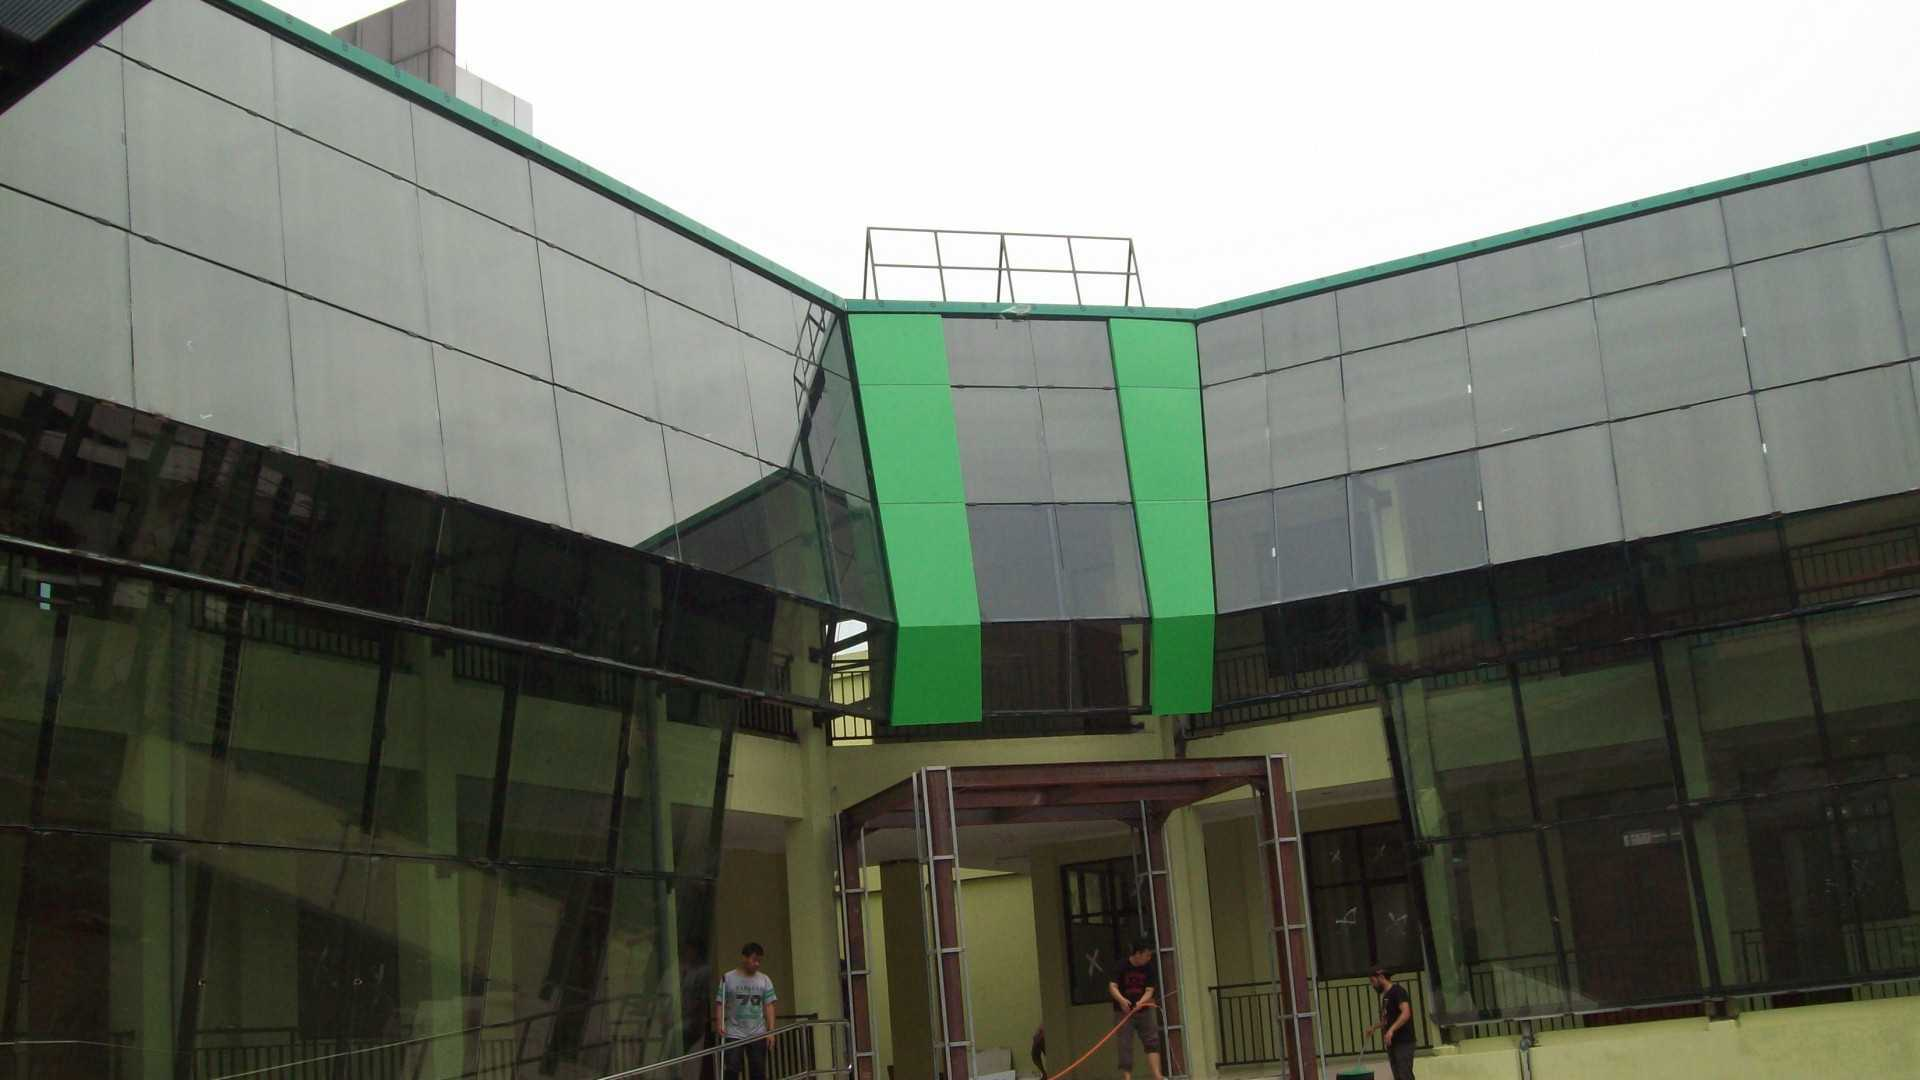 Archdesignbuild7 Kumkm Building Soekarno Hatta, Bandung, West Java Soekarno Hatta, Bandung, West Java Photo-21040 Modern  21040